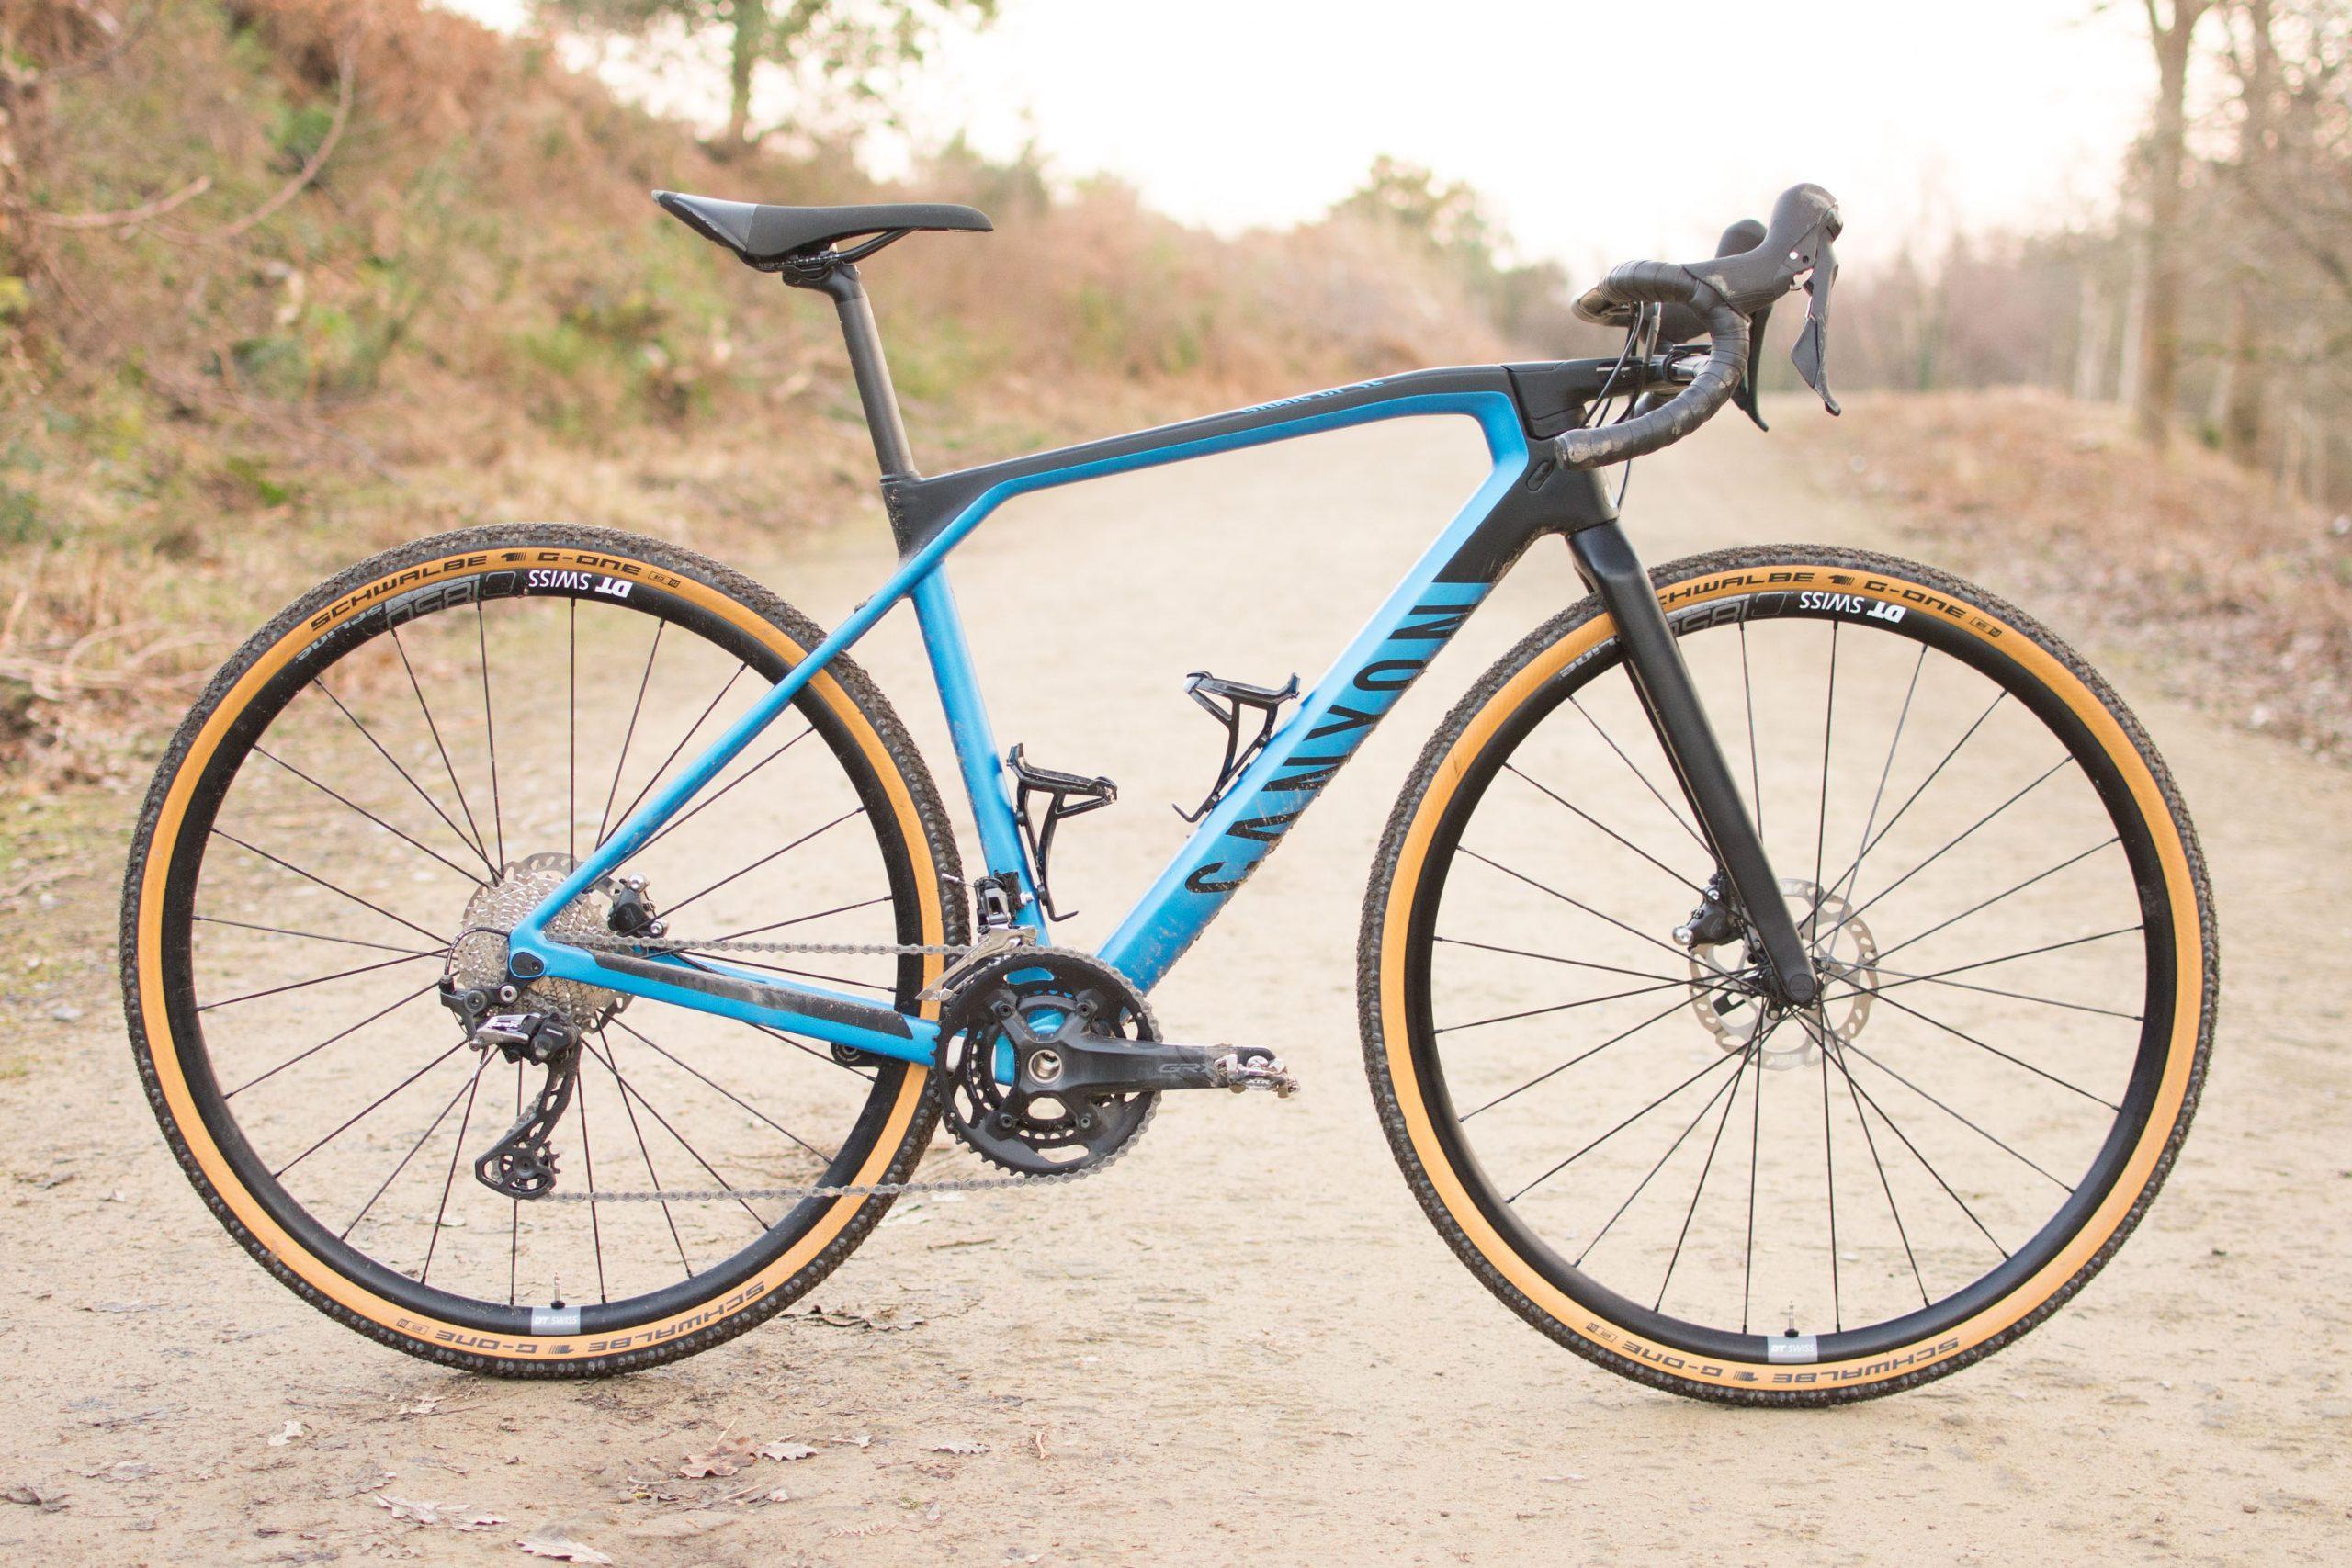 Marin Bikes Aluminum Bolt On Adjustable Seat Post 27.2mm *NEW*